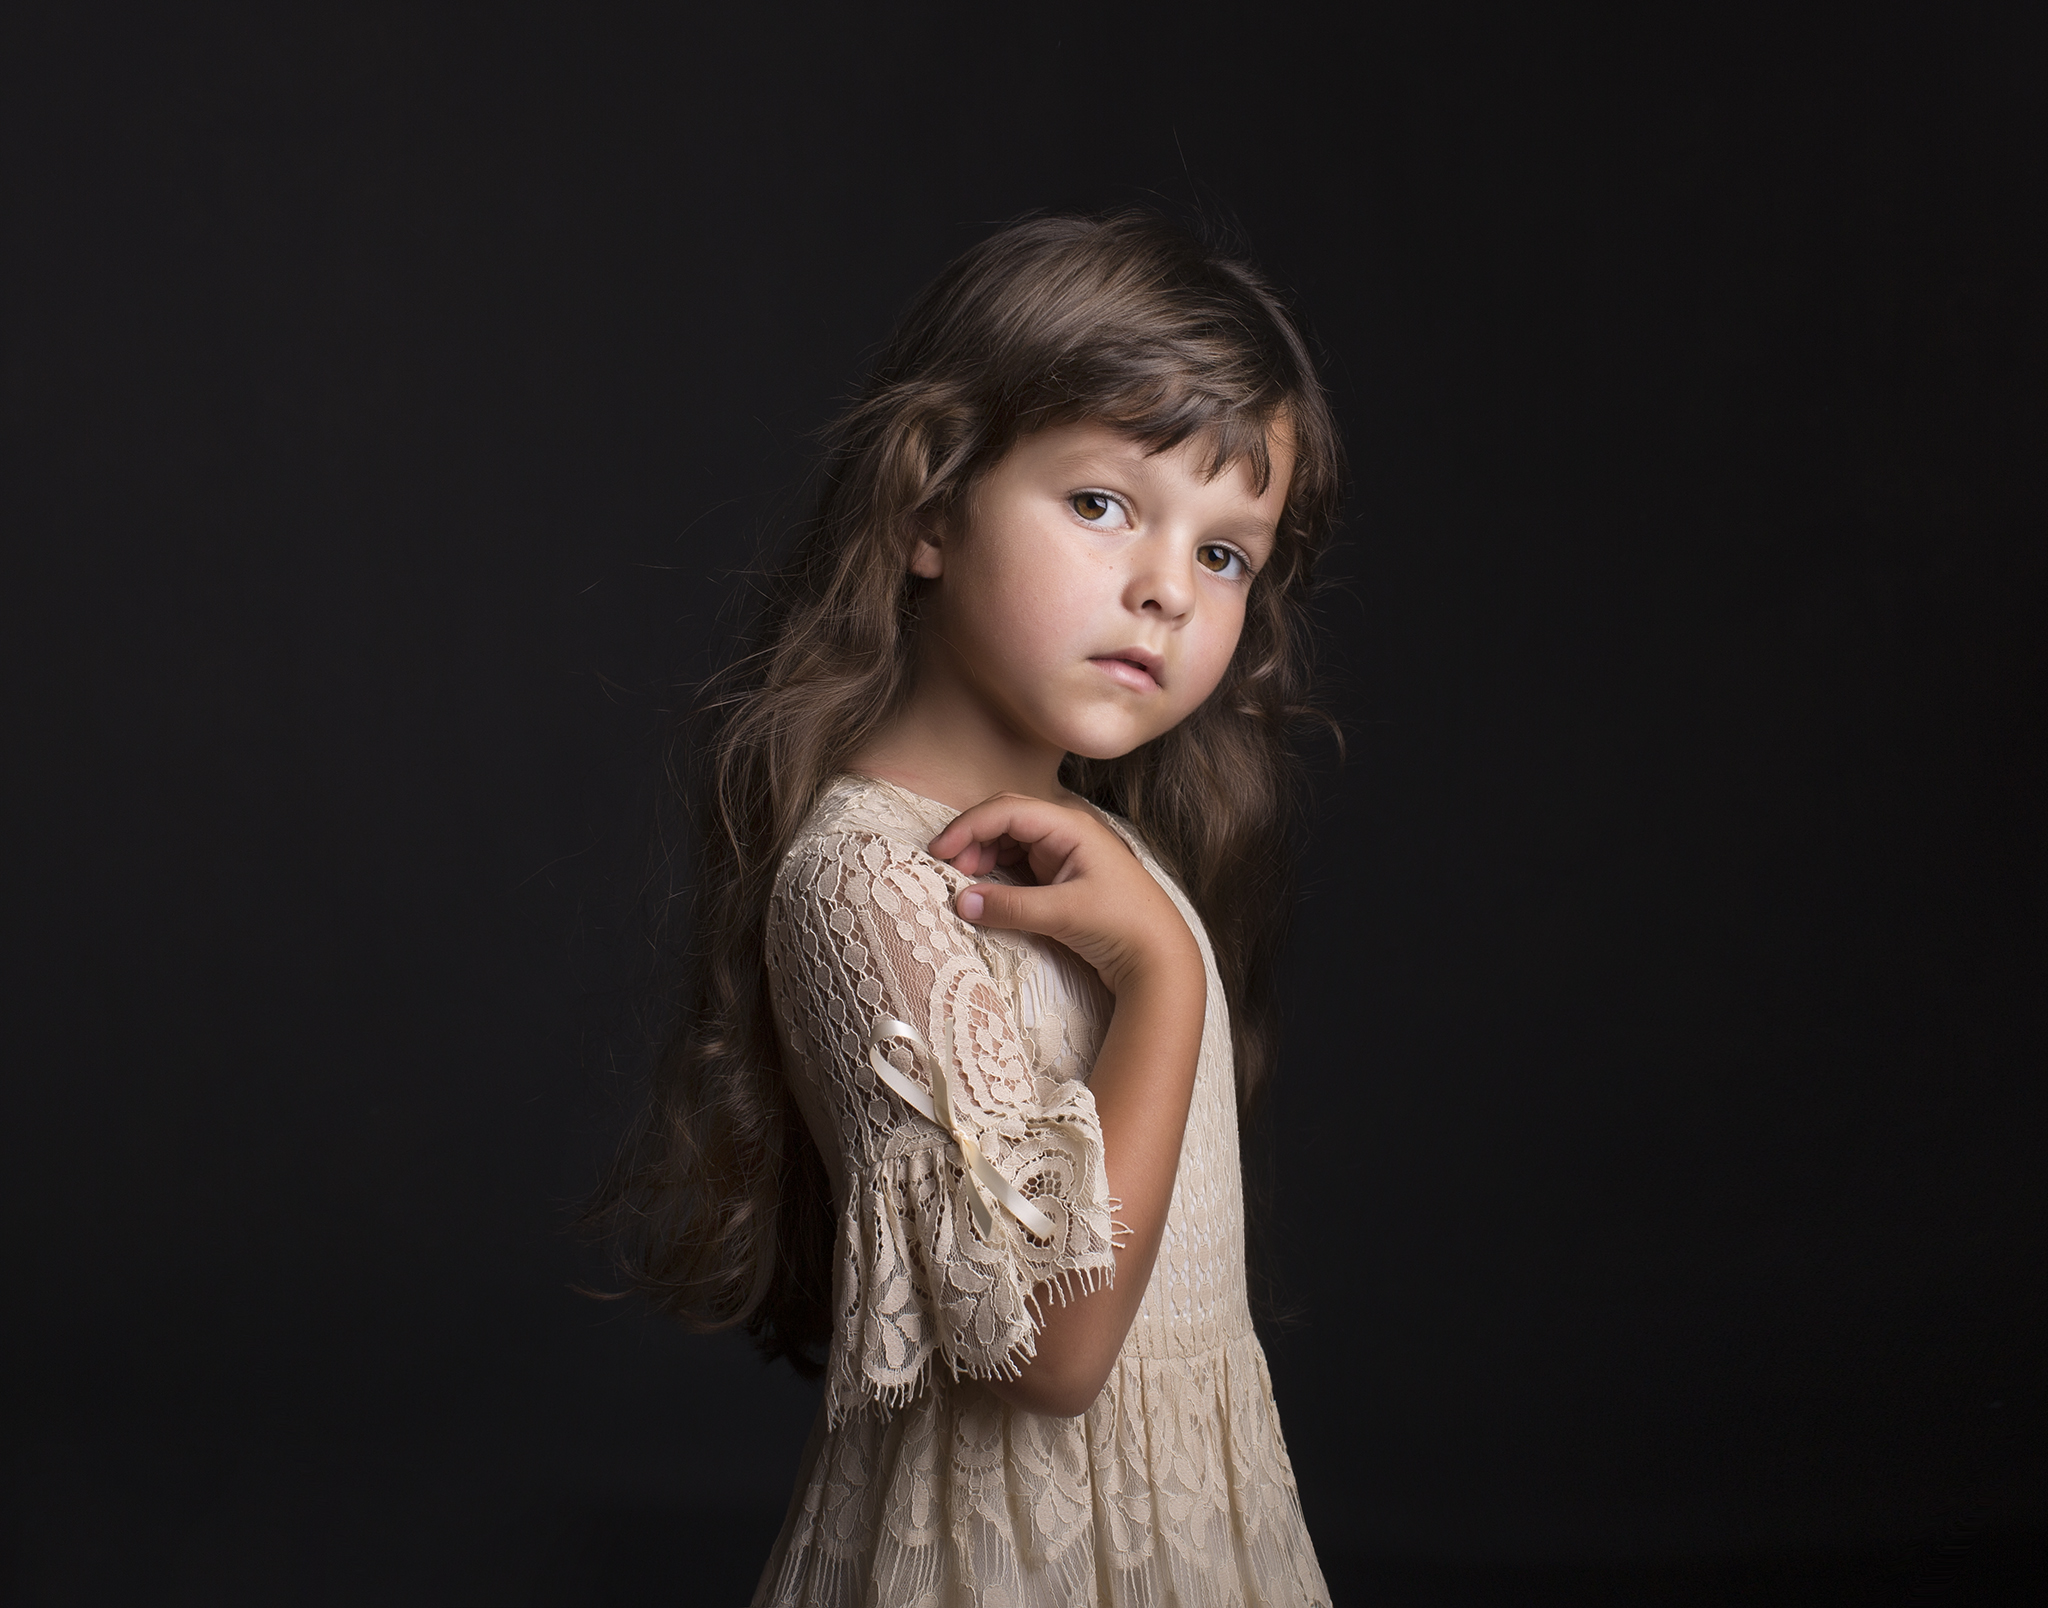 elizabethgfineartphotography_kingslangley_model_isabella_kidslondon_3.jpg